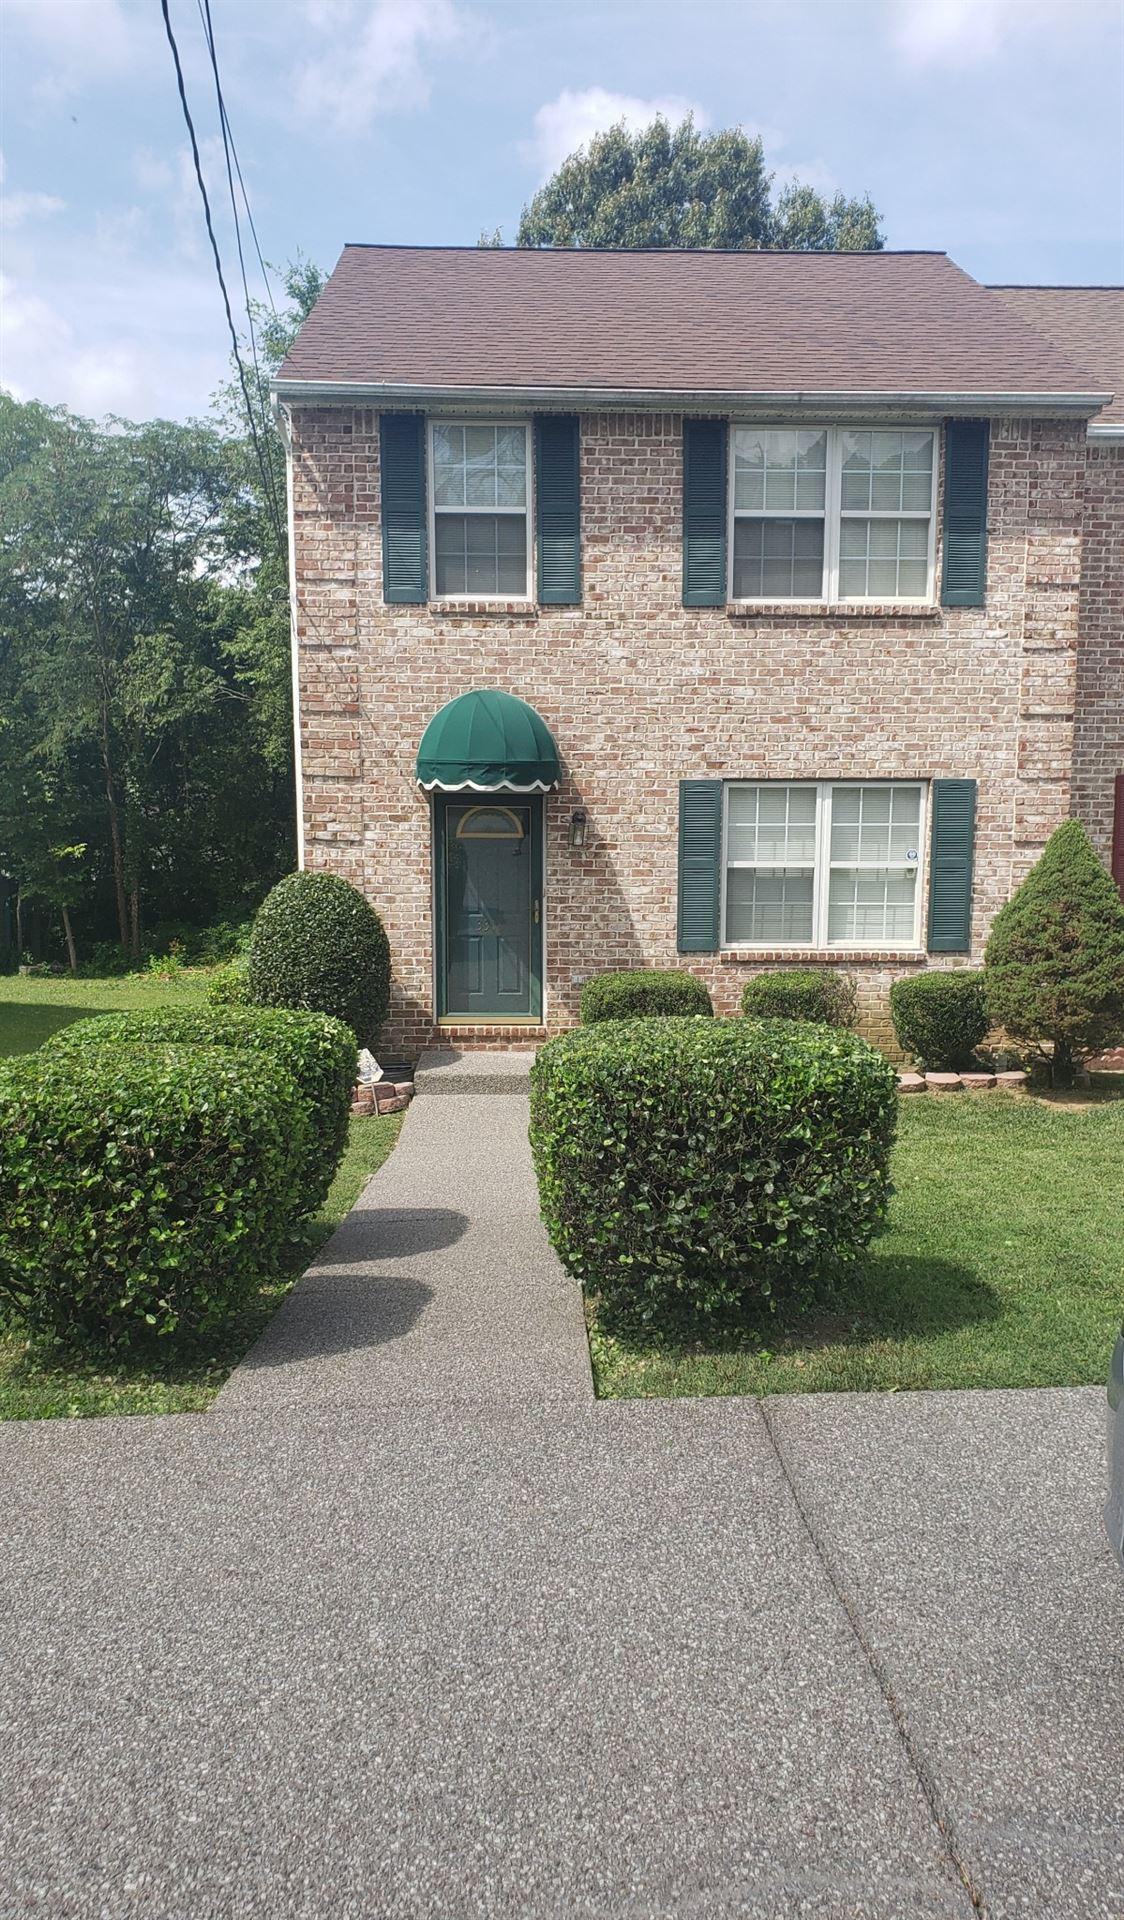 Photo of 3318 Quail View Dr, Nashville, TN 37214 (MLS # 2244456)